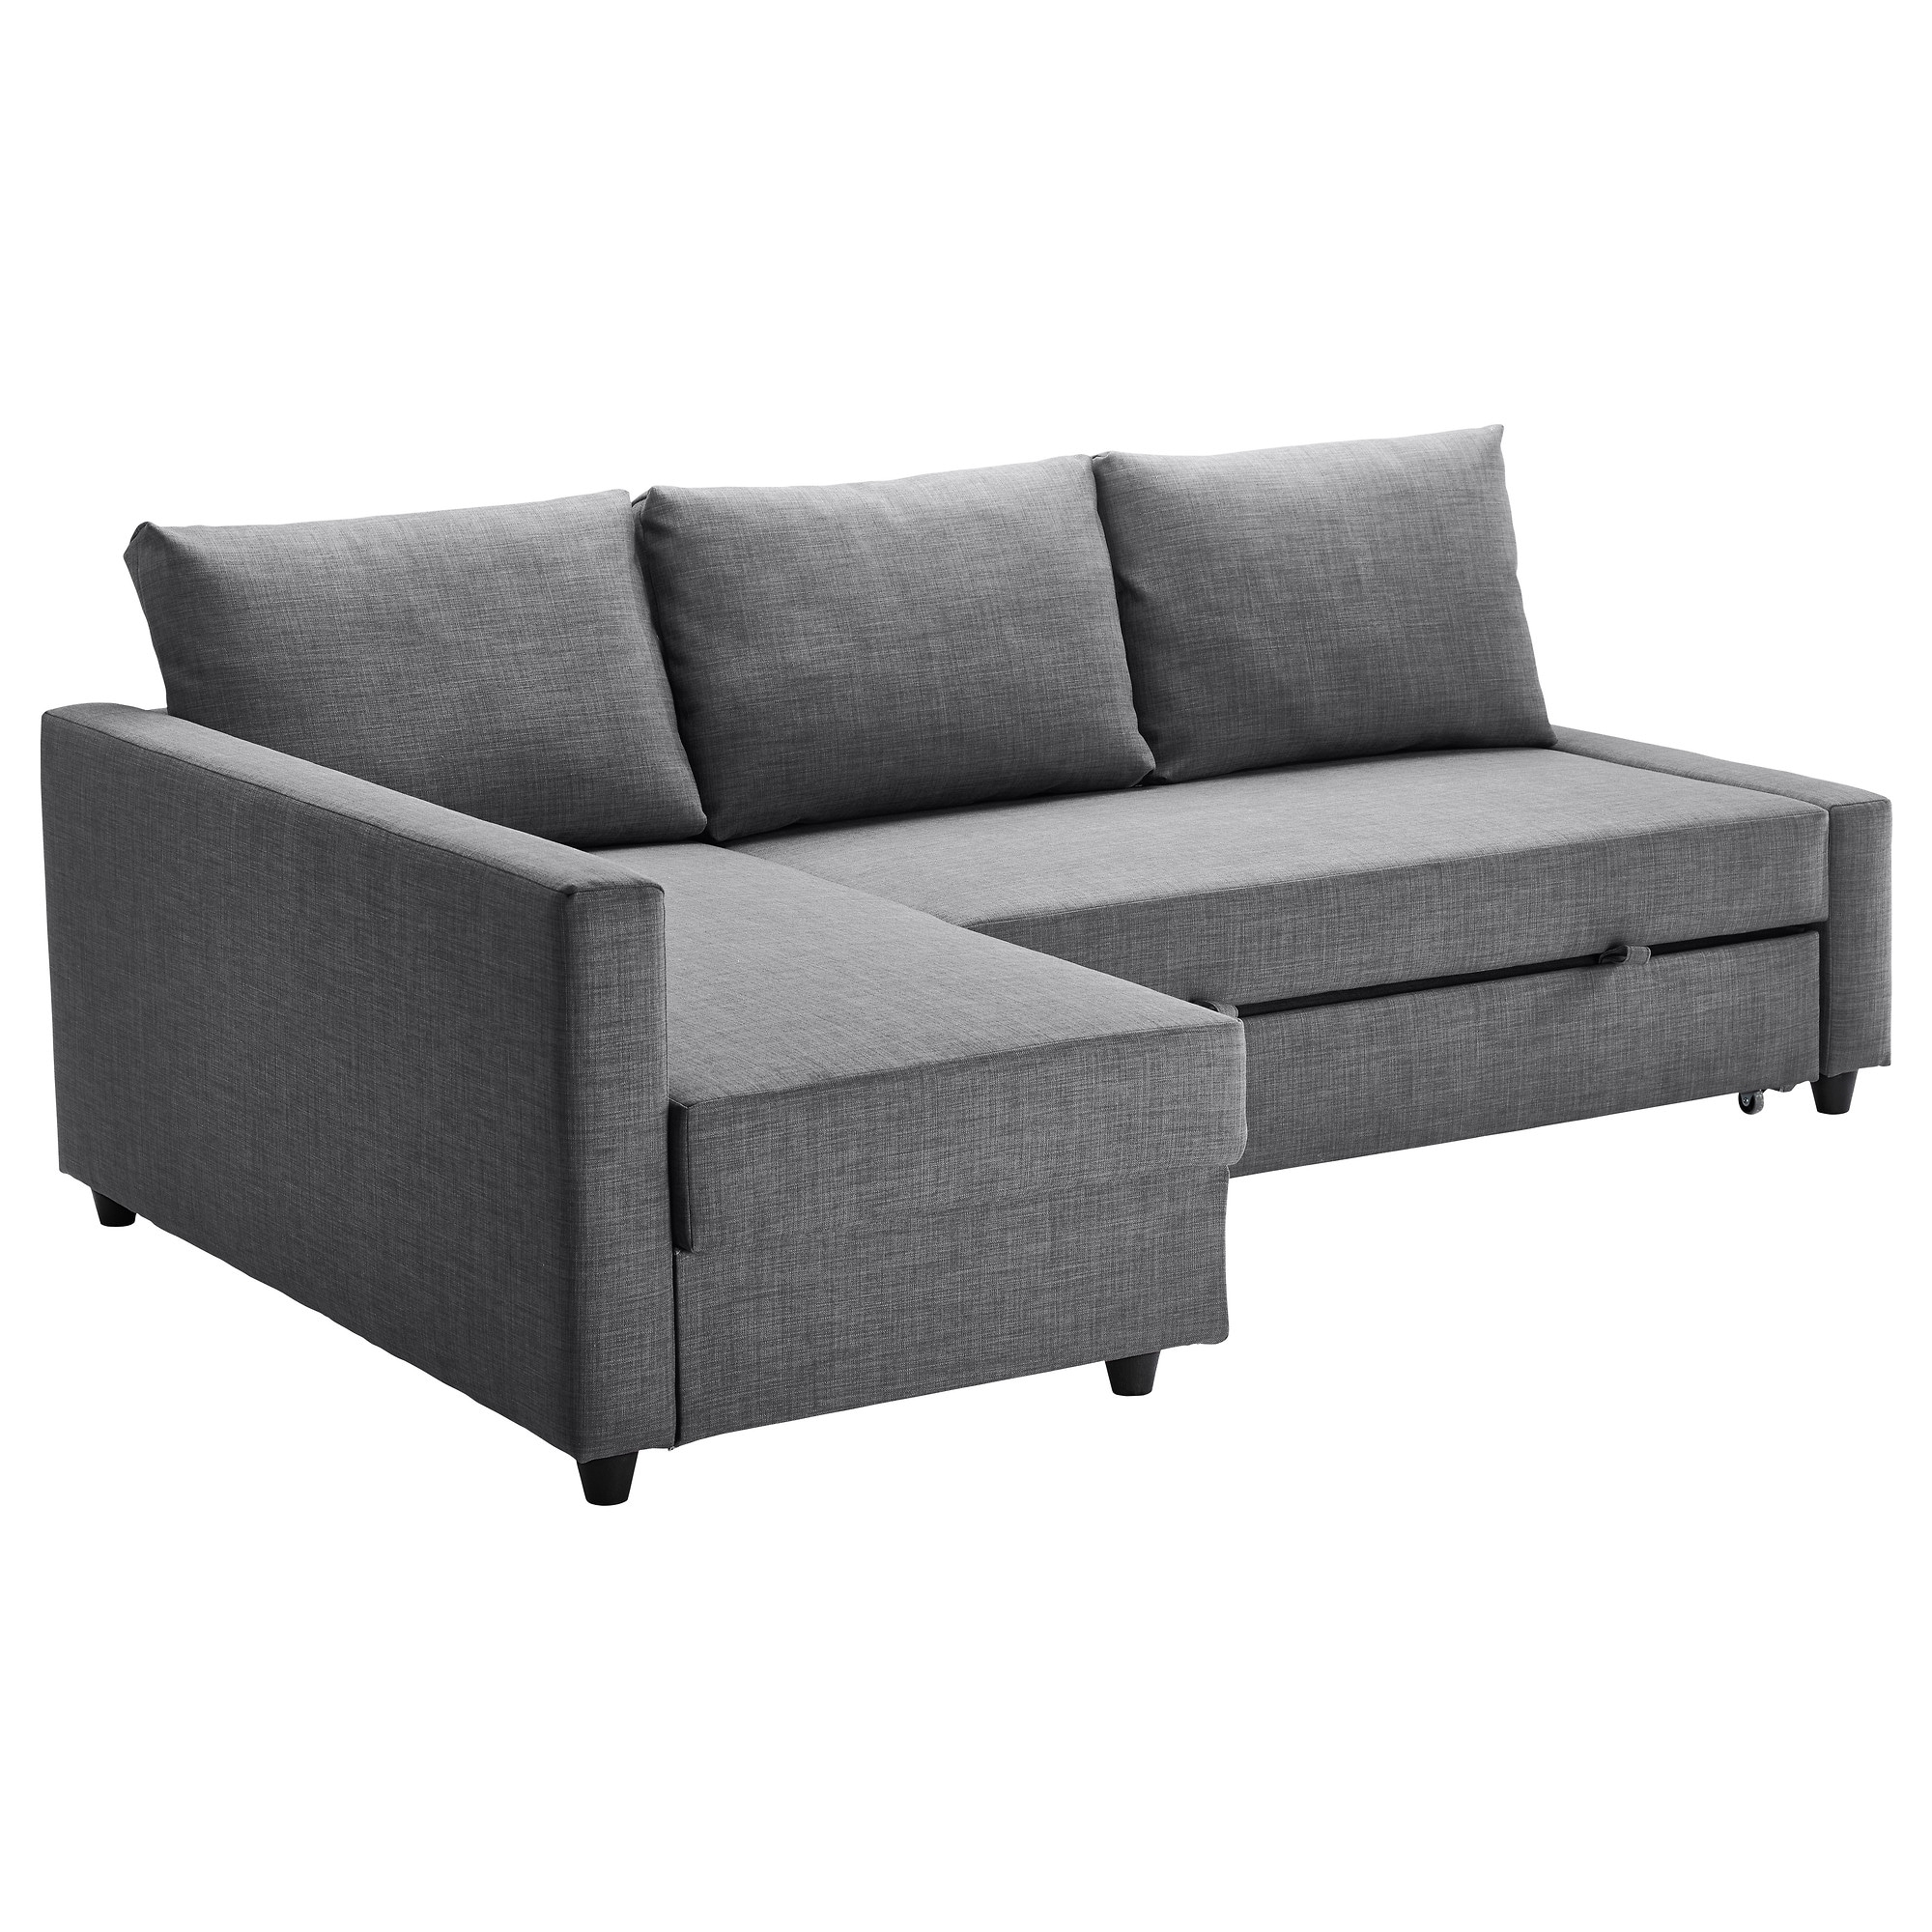 Preferred Chaise Sofa Chairs In Friheten Corner Sofa Bed With Storage Skiftebo Dark Grey – Ikea (View 12 of 20)